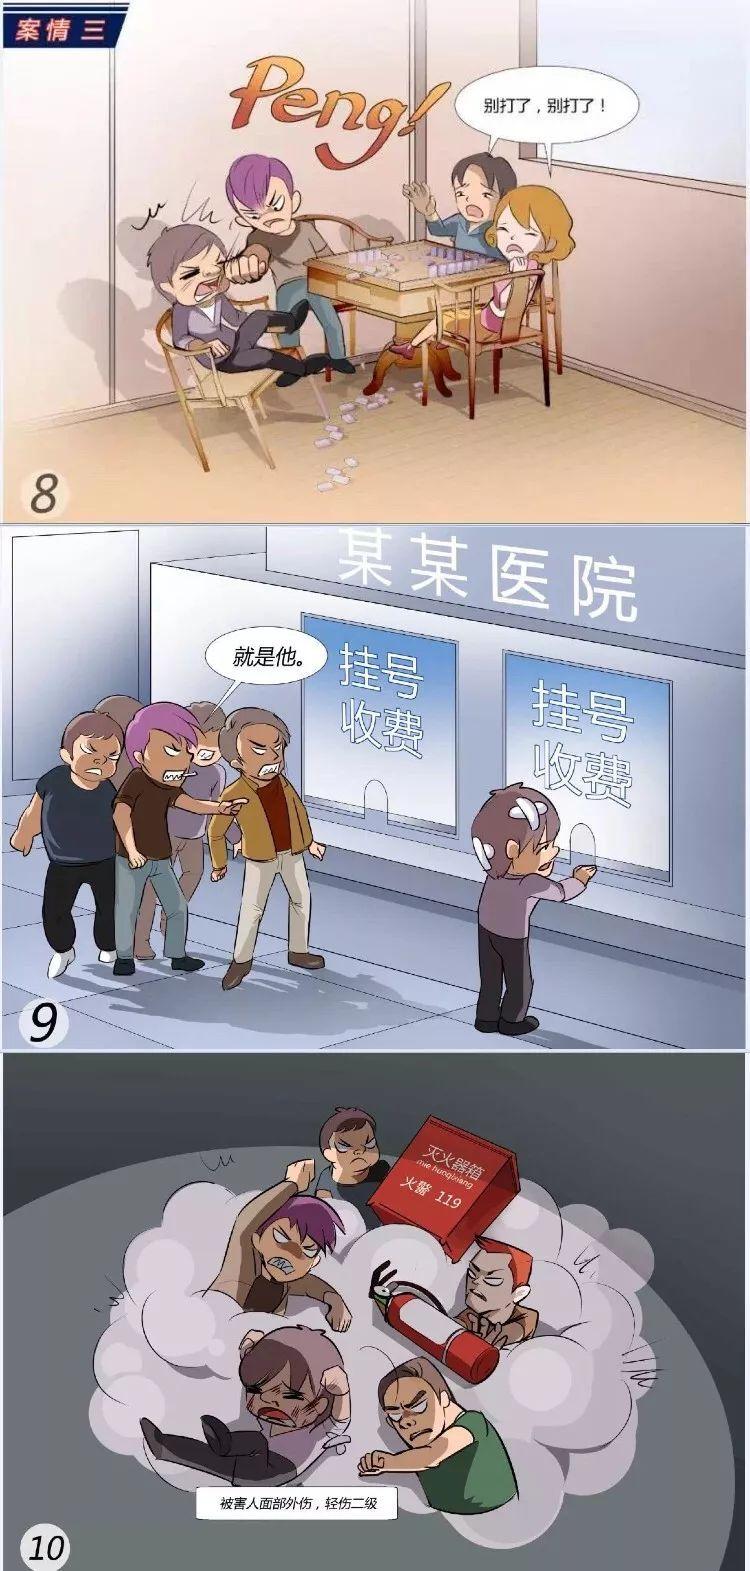 betway必威官网 14